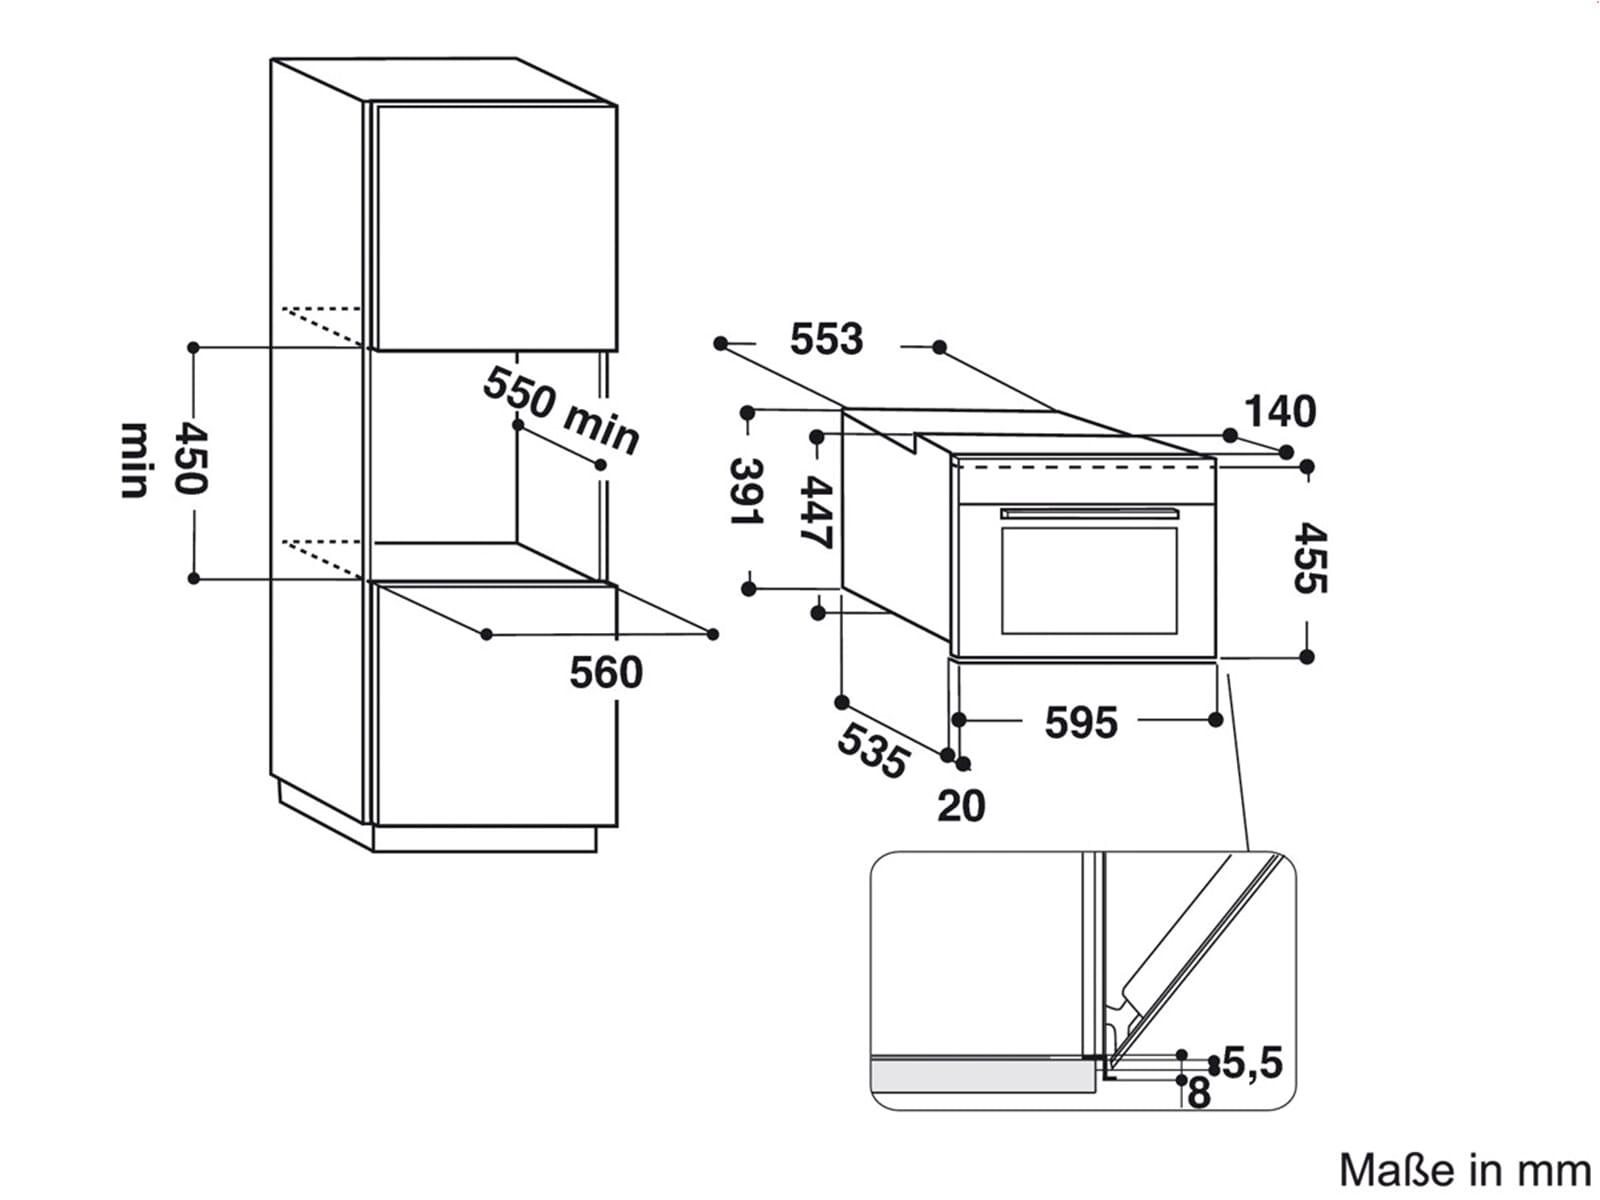 Bauknecht EMPK5 5645 PT Einbau-Mikrowelle Edelstahl